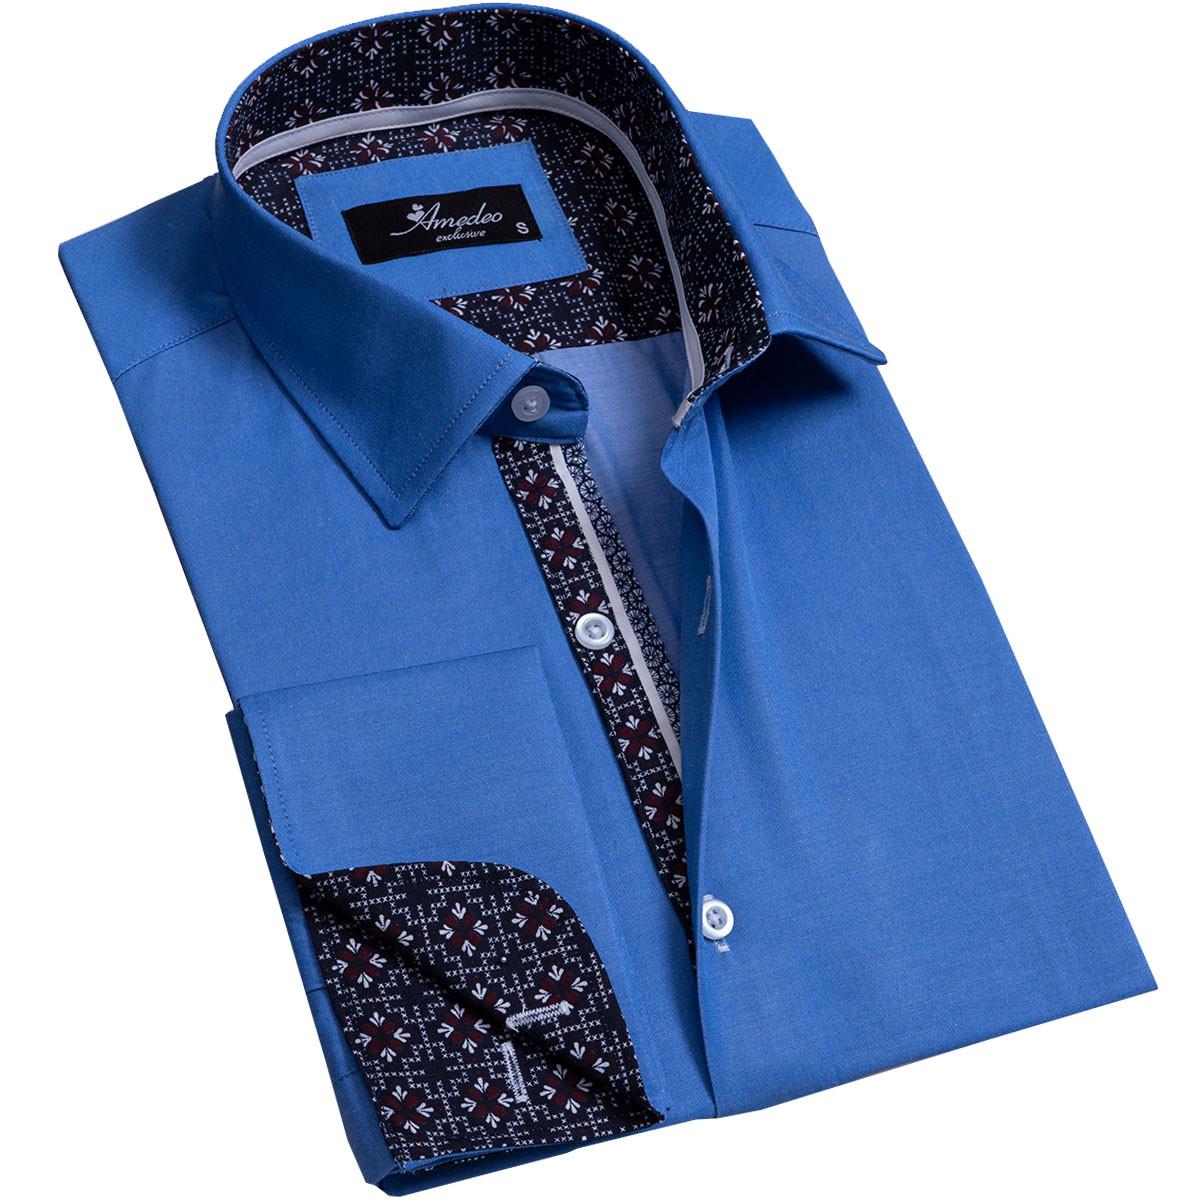 European Made & Designed Reversible Cuff Premium French Cuff Dress Shirt - medium blue